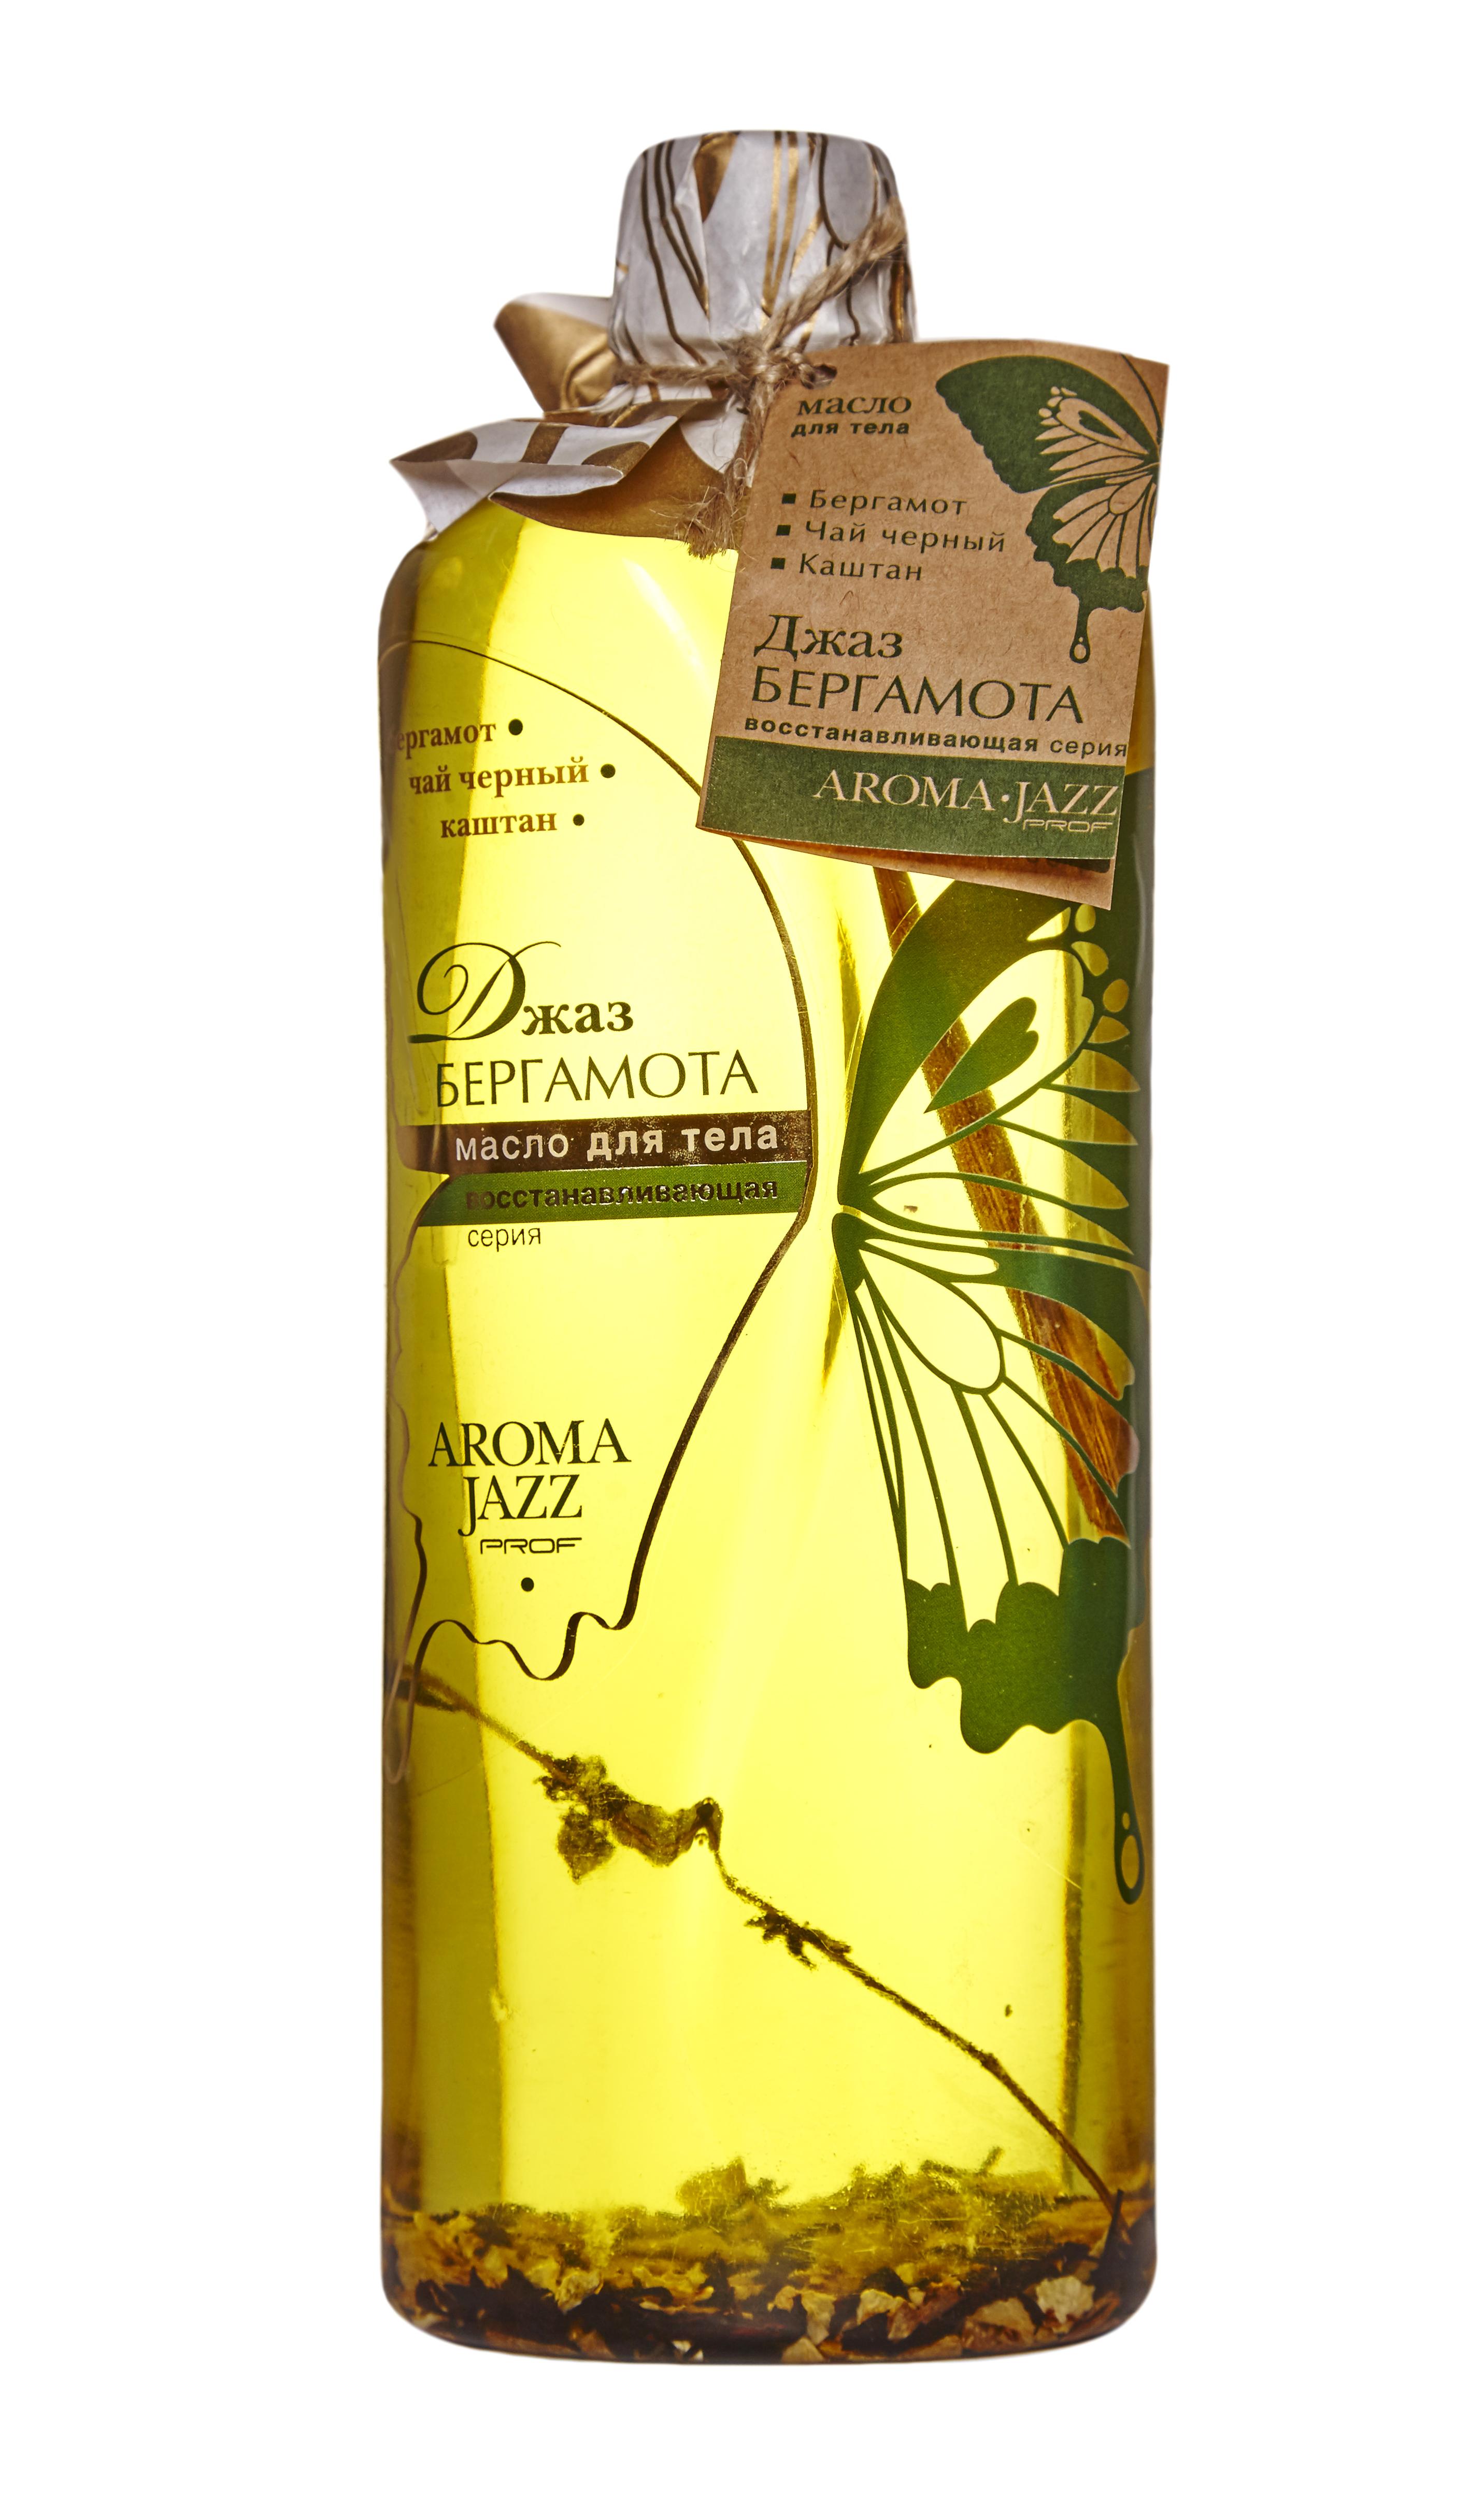 AROMA JAZZ Масло массажное жидкое для тела Джаз бергамота 1000 мл - Масла